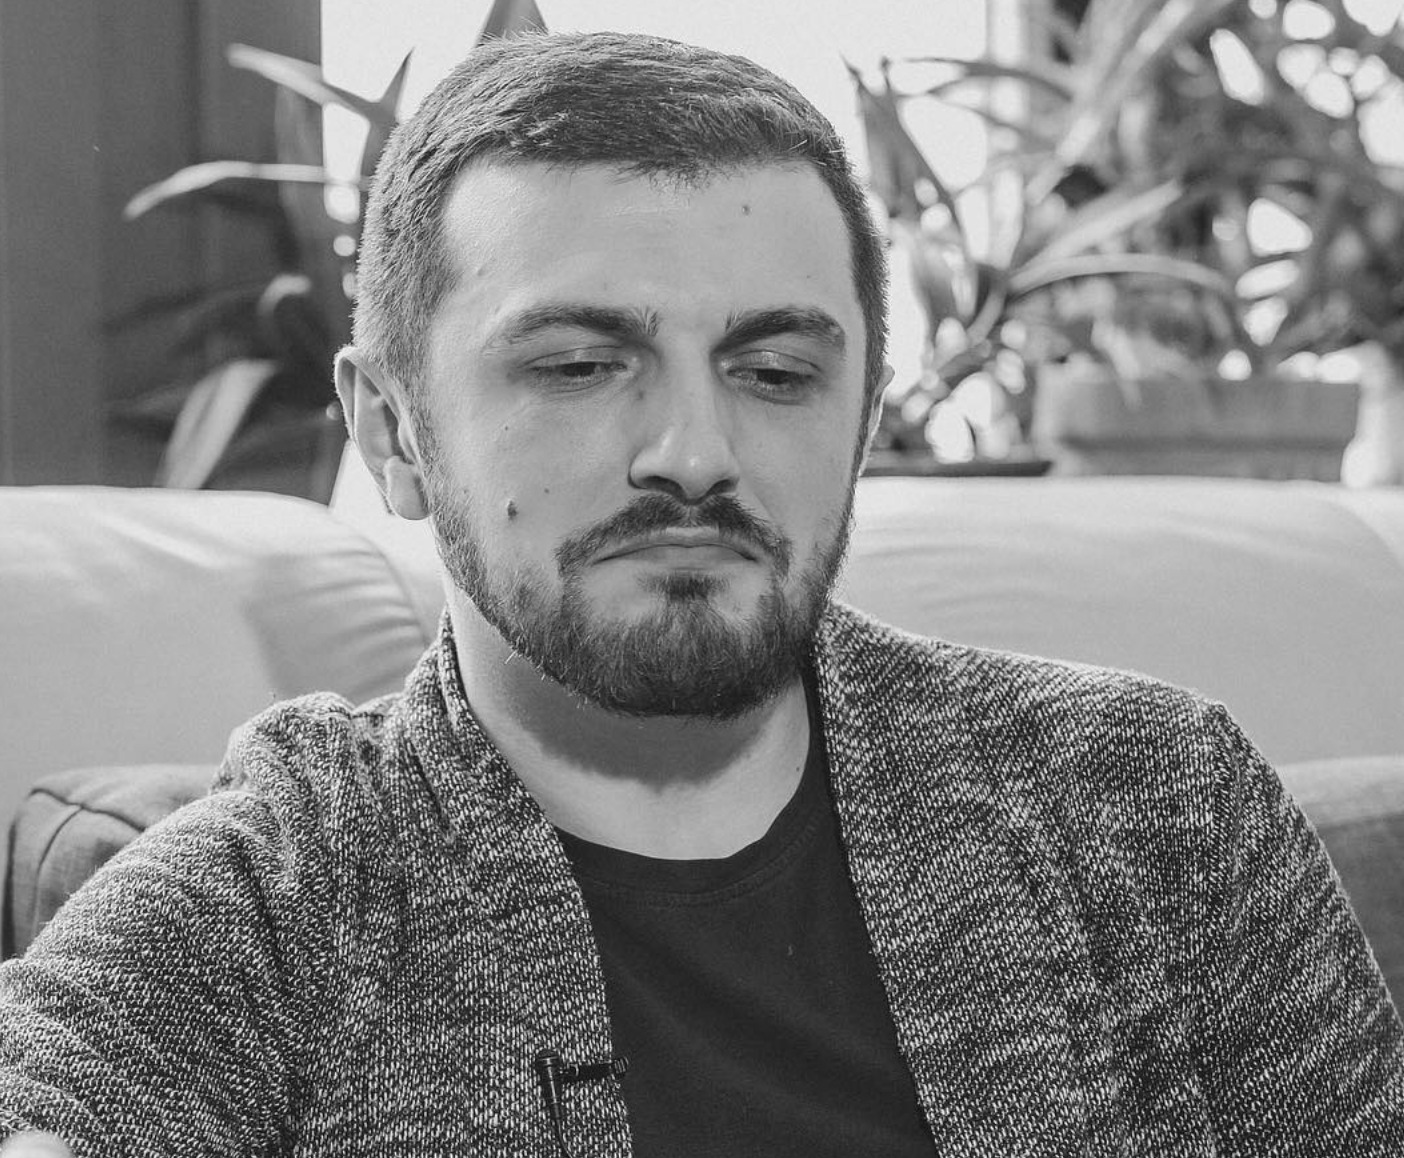 Дагестанского блогера Романа Бабаева арестовали во Внуково